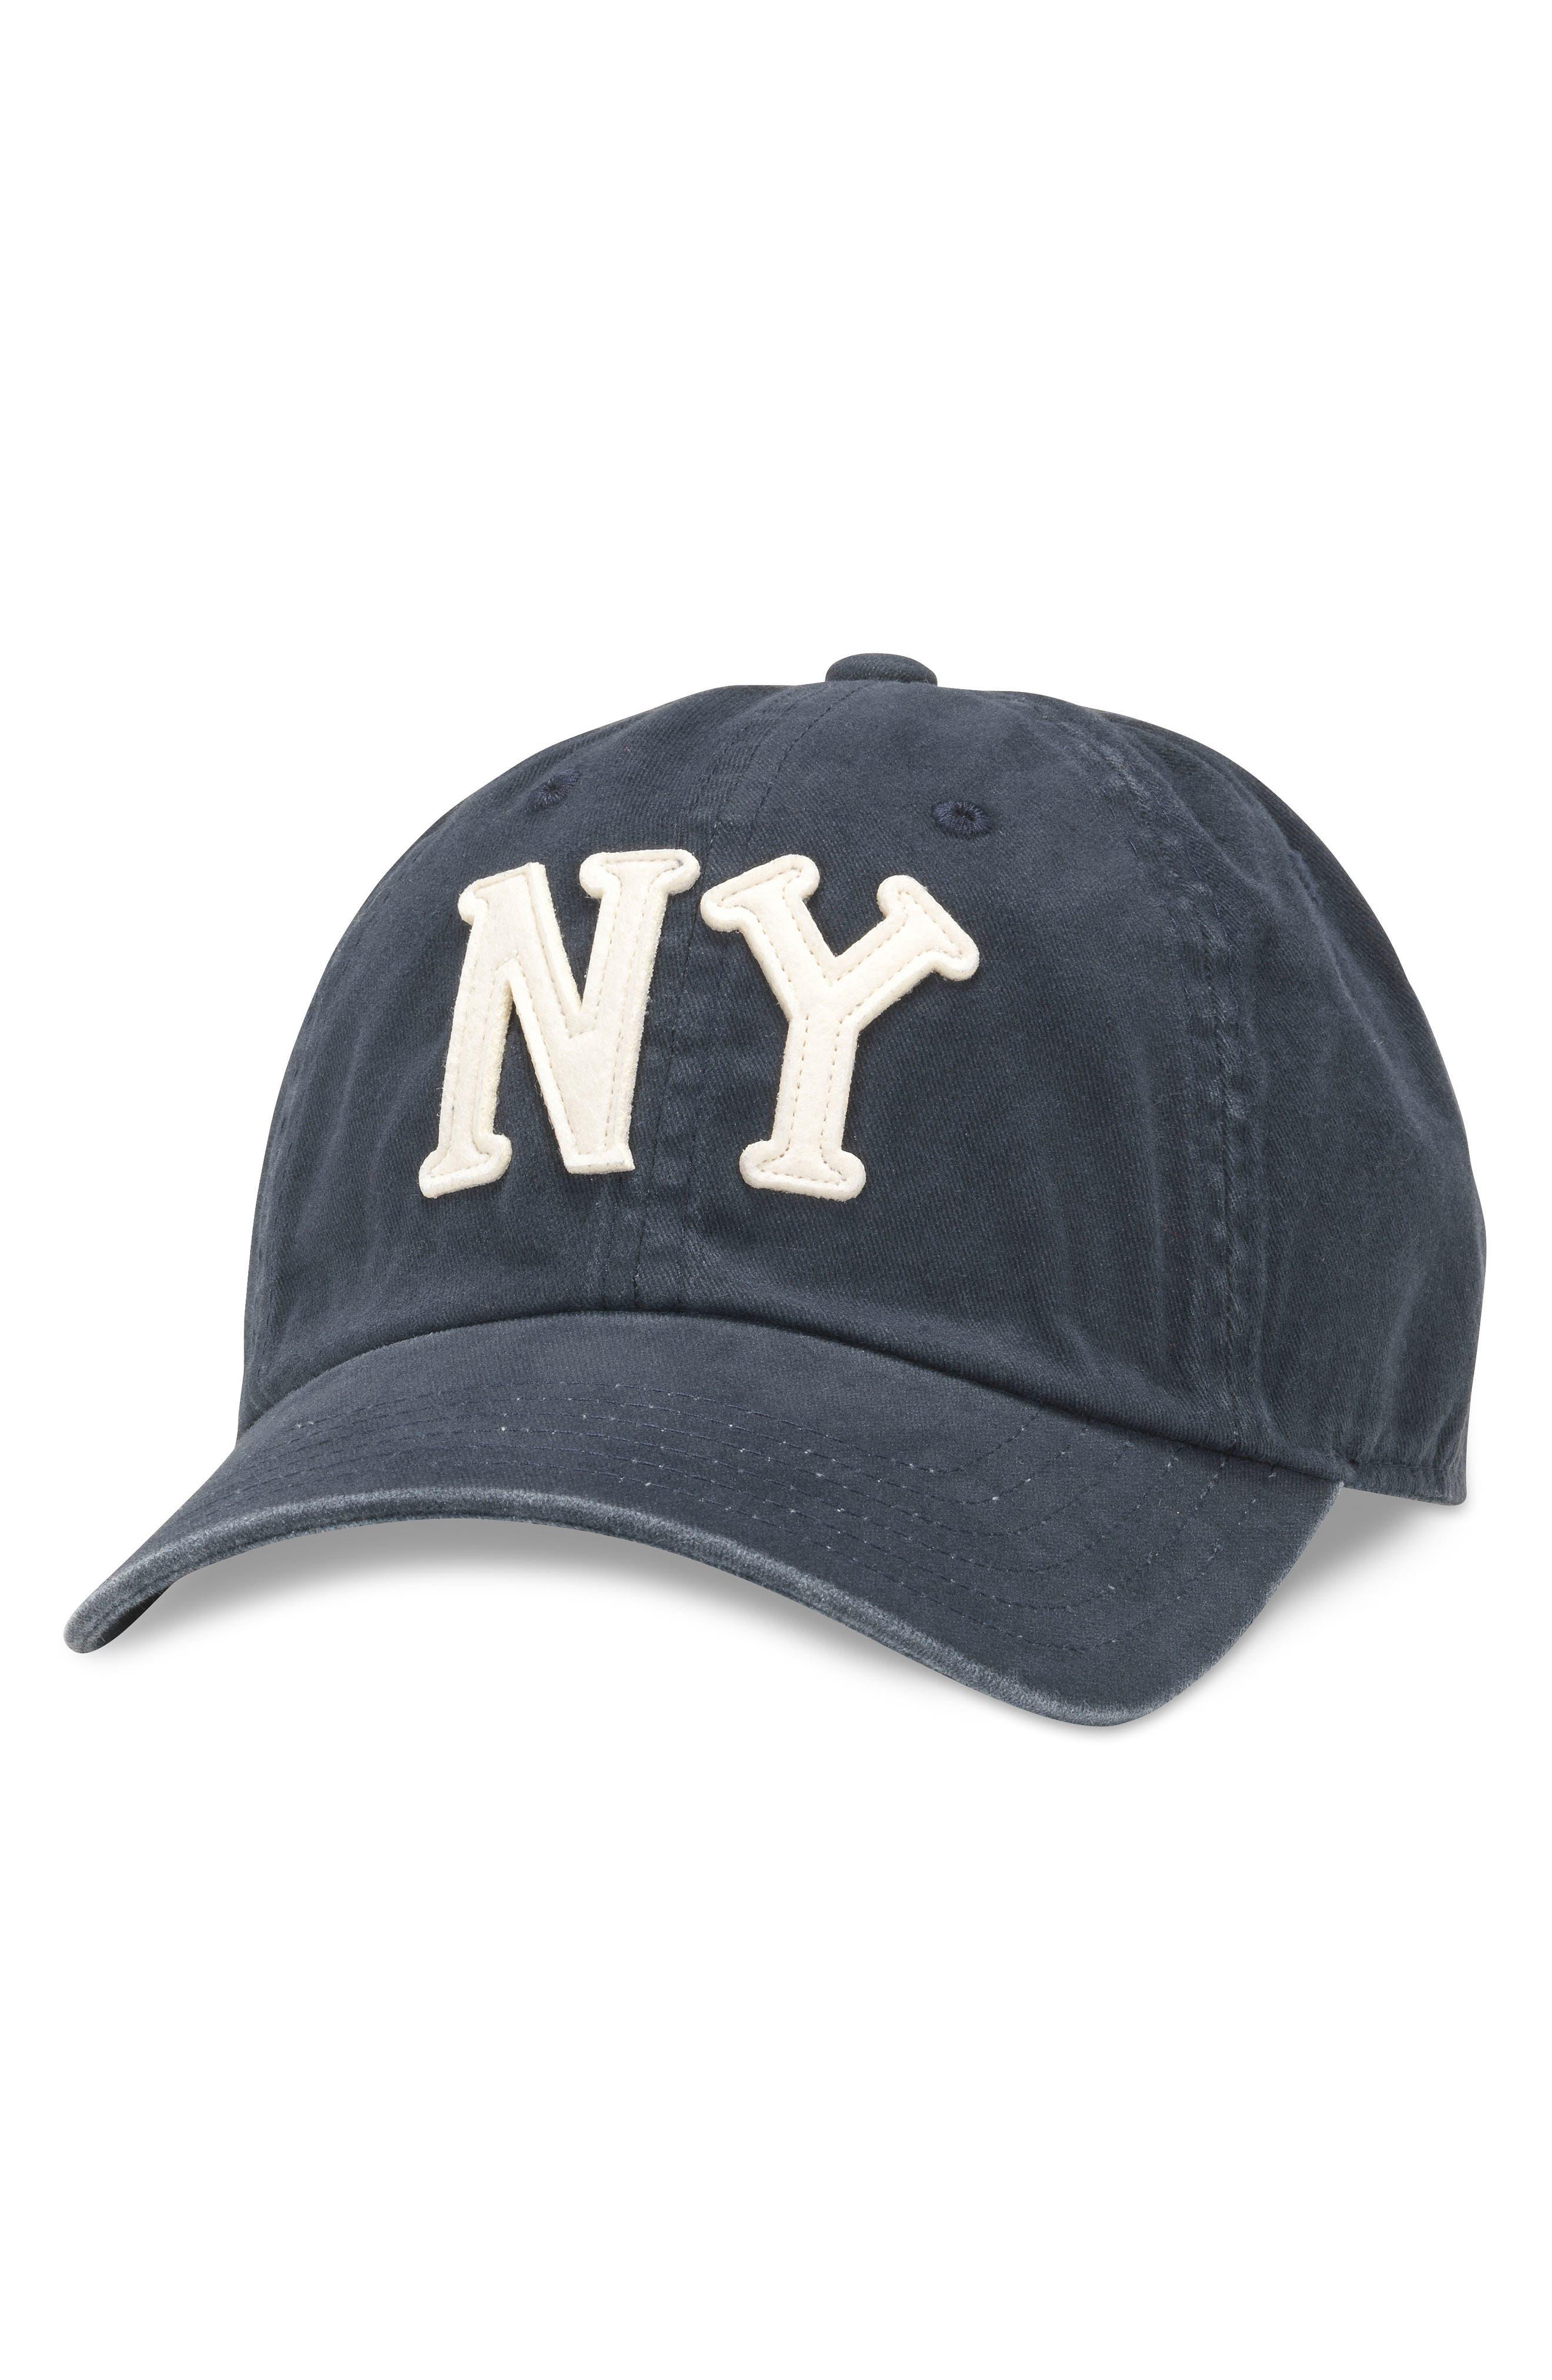 New York Archive Ball Cap,                             Main thumbnail 1, color,                             BLUE